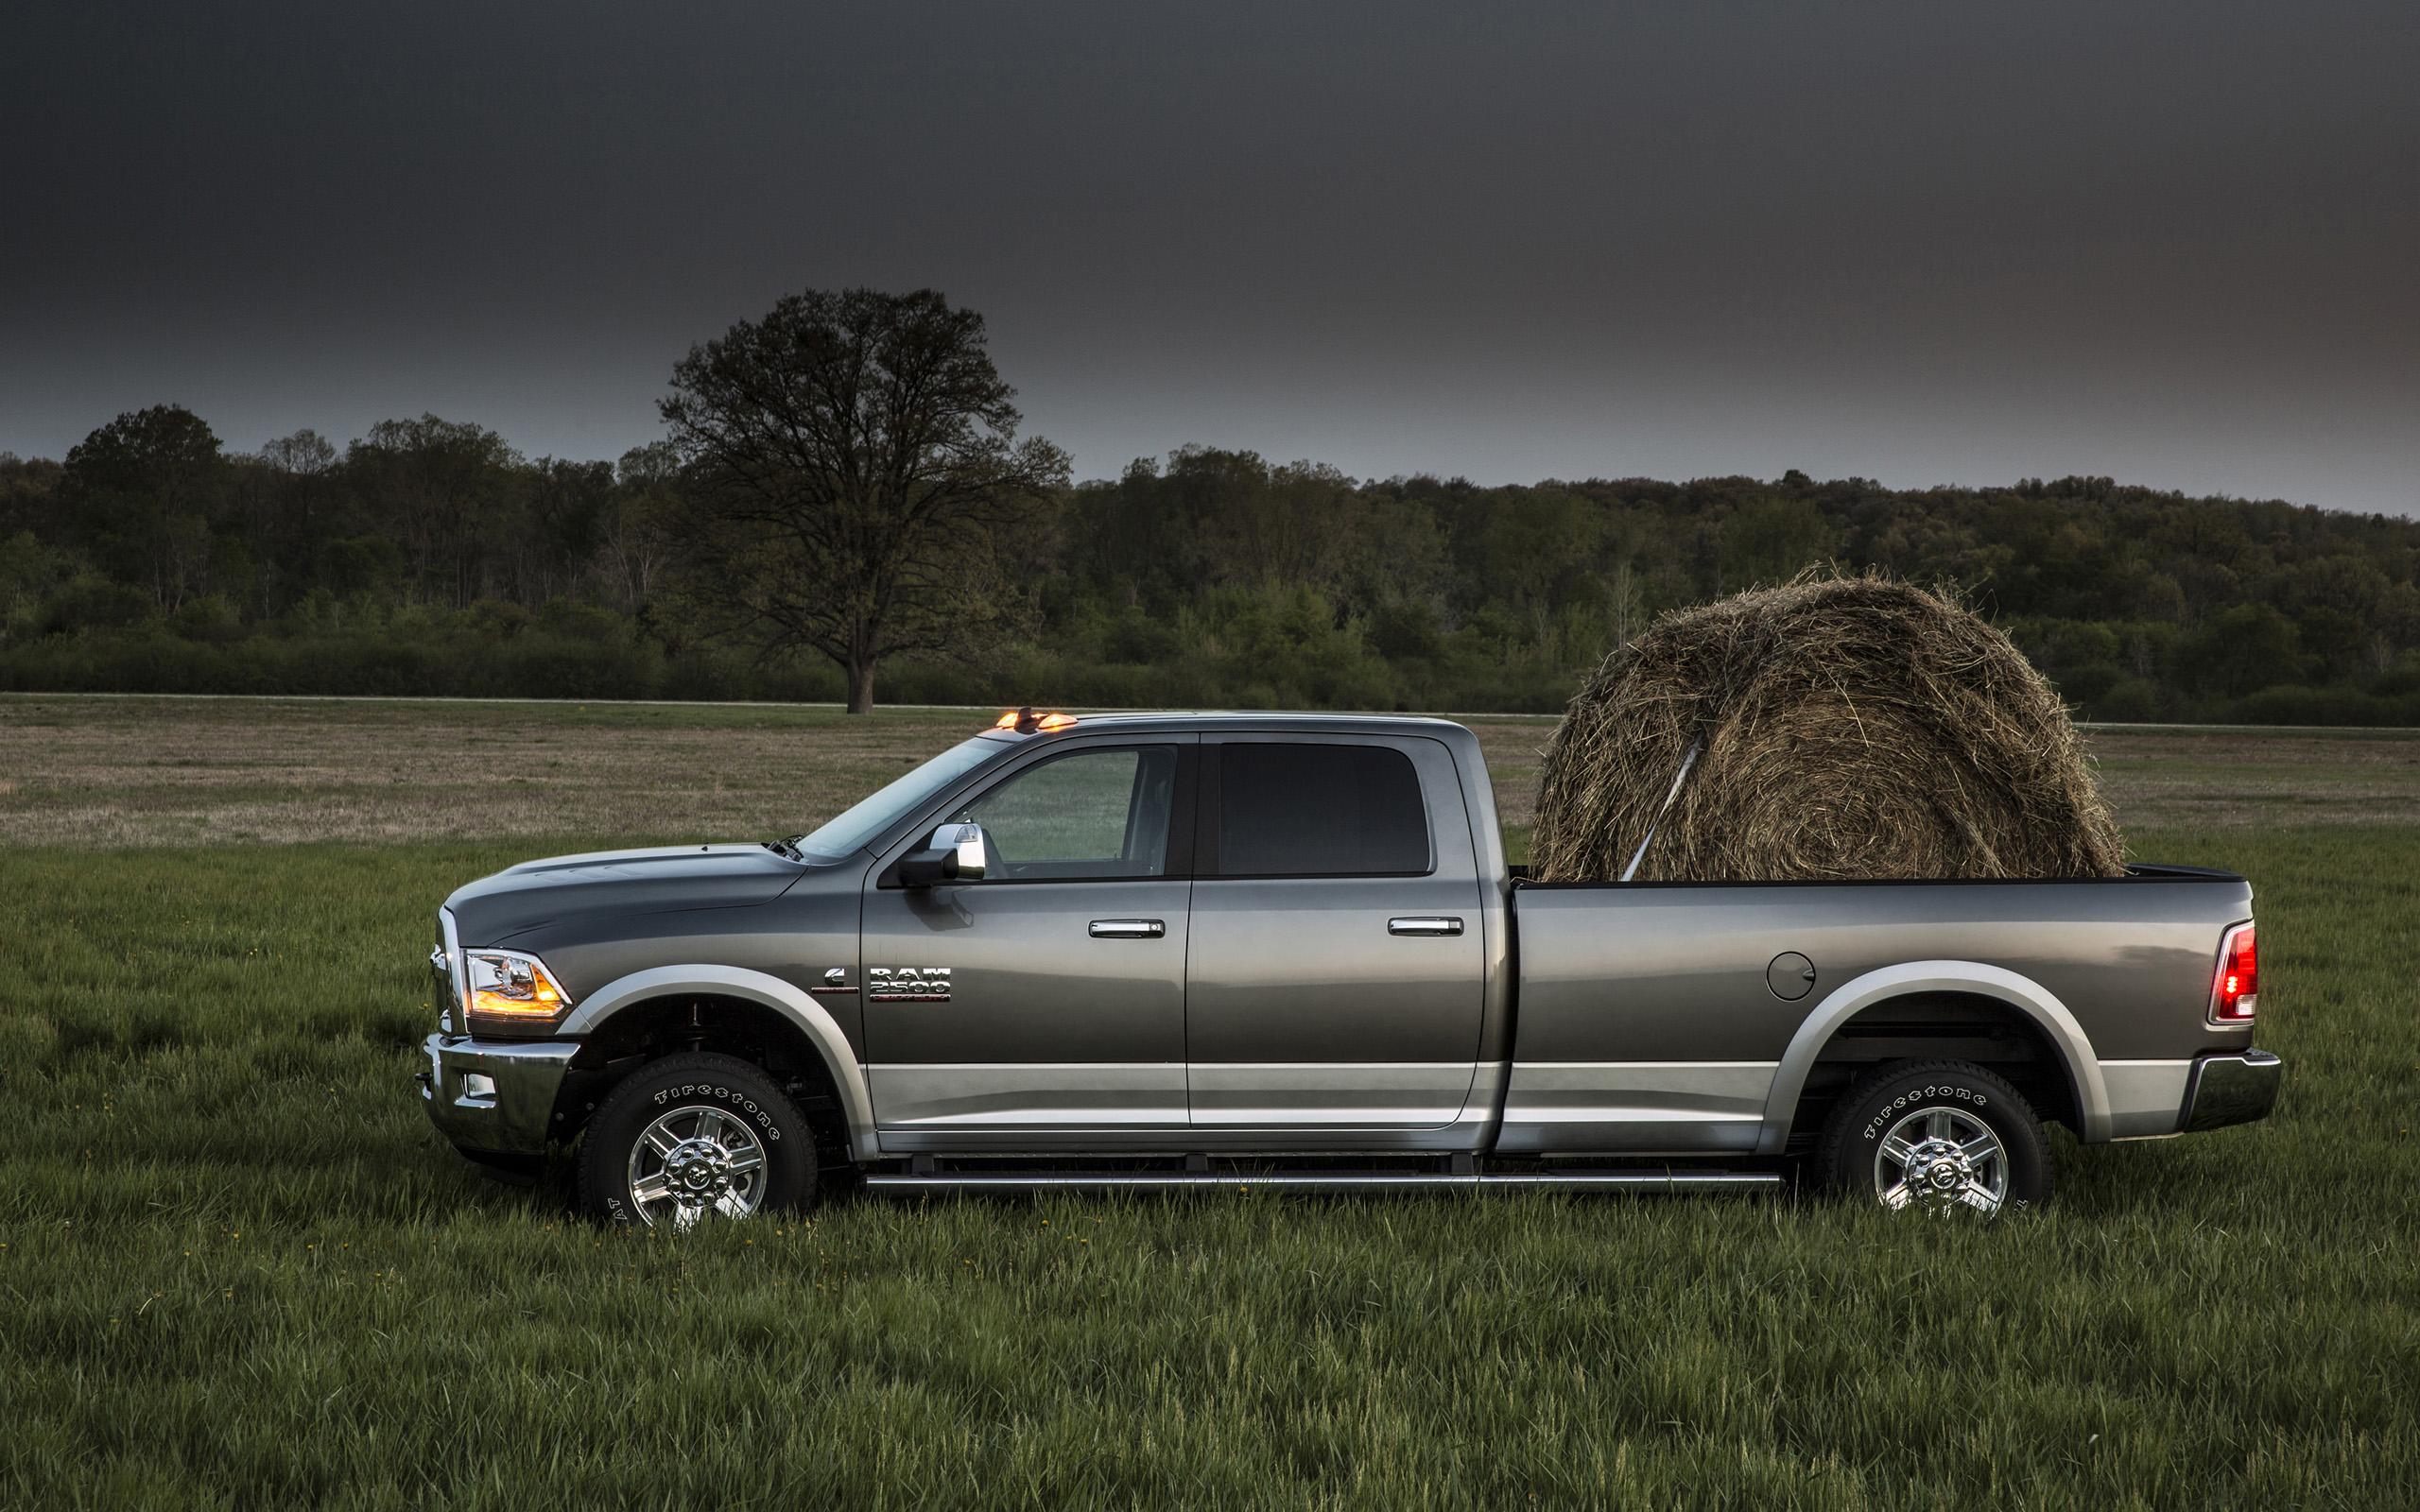 Dodge Ram Wallpaper 44935 2560x1600px